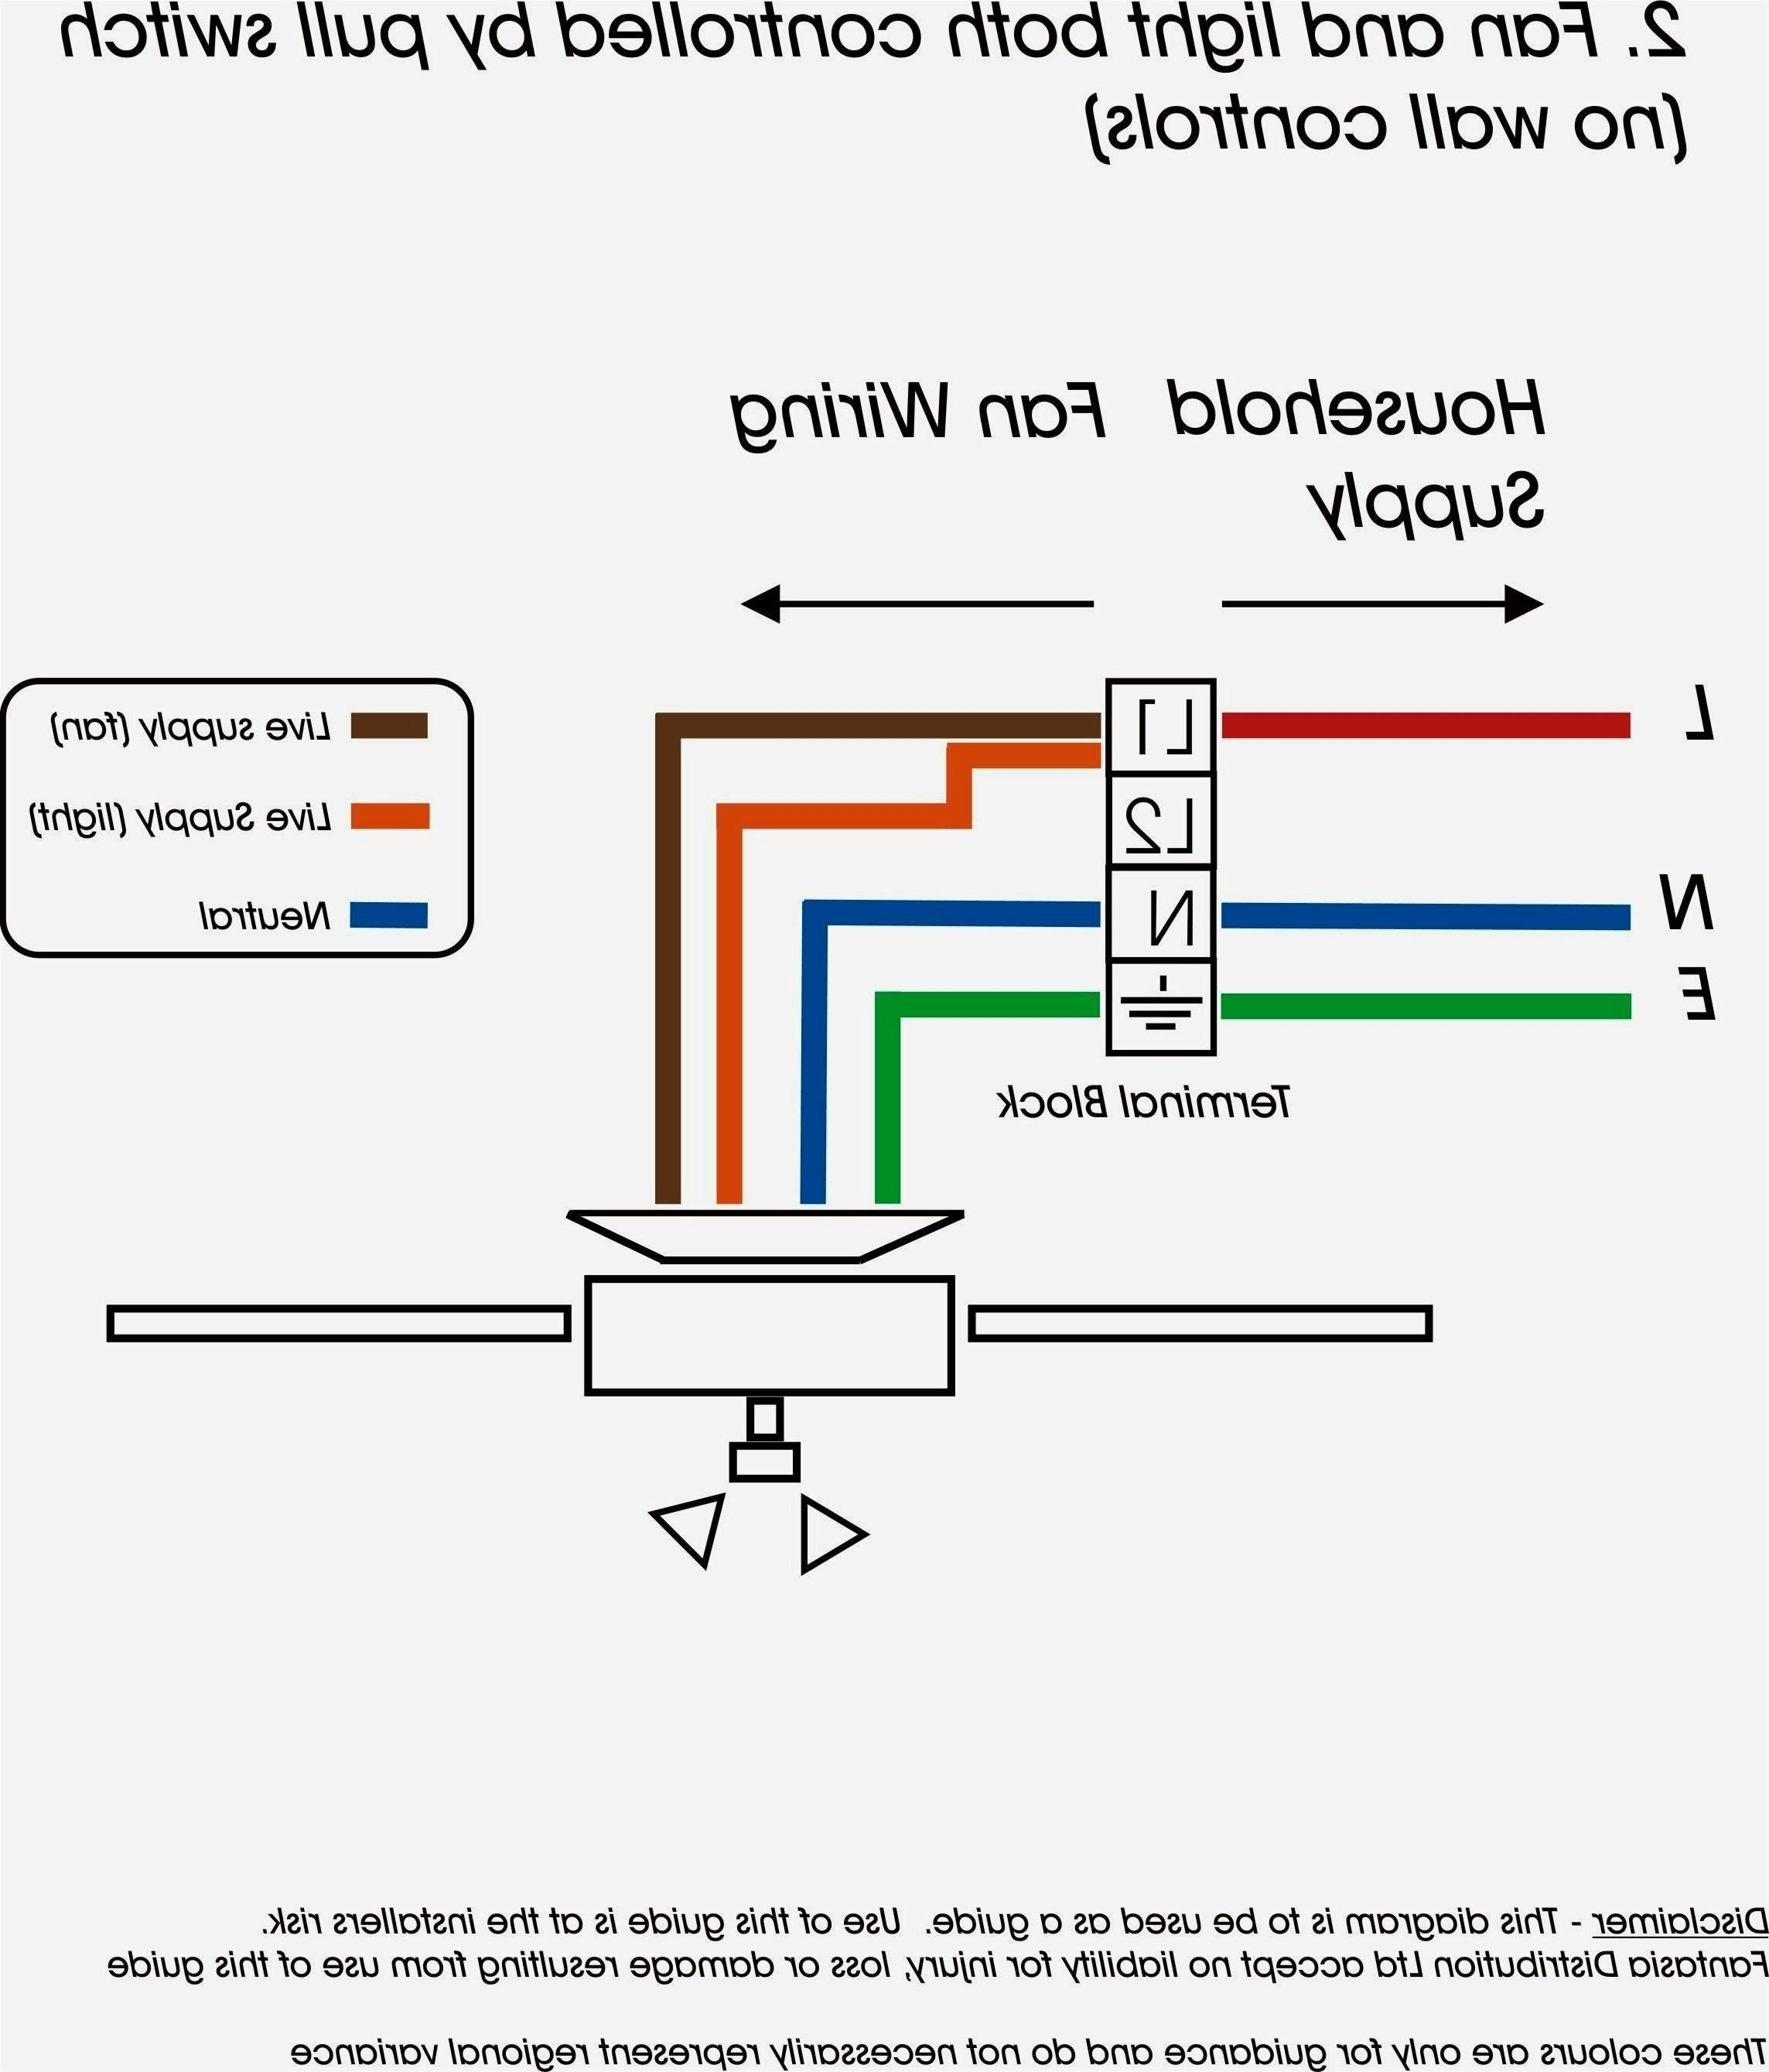 3 Speed Fan Switch Wiring Diagram Wiring Diagram for A Ceiling Fan Copy Pull Chain Light Switch Of 3 Speed Fan Switch Wiring Diagram